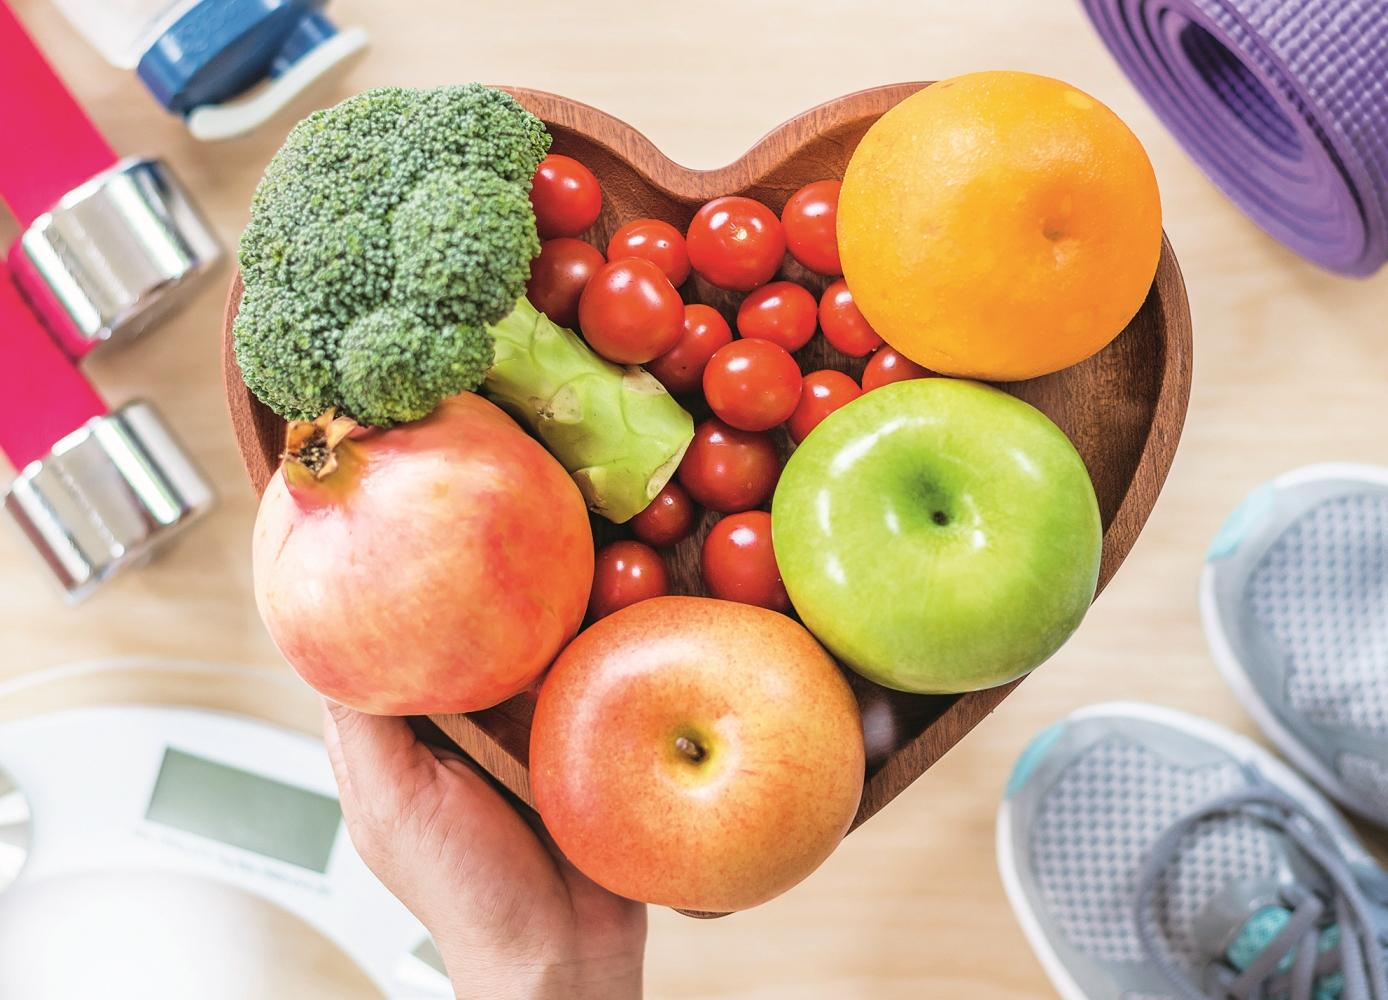 Heart Healthy Habits Reduce Dementia Risk